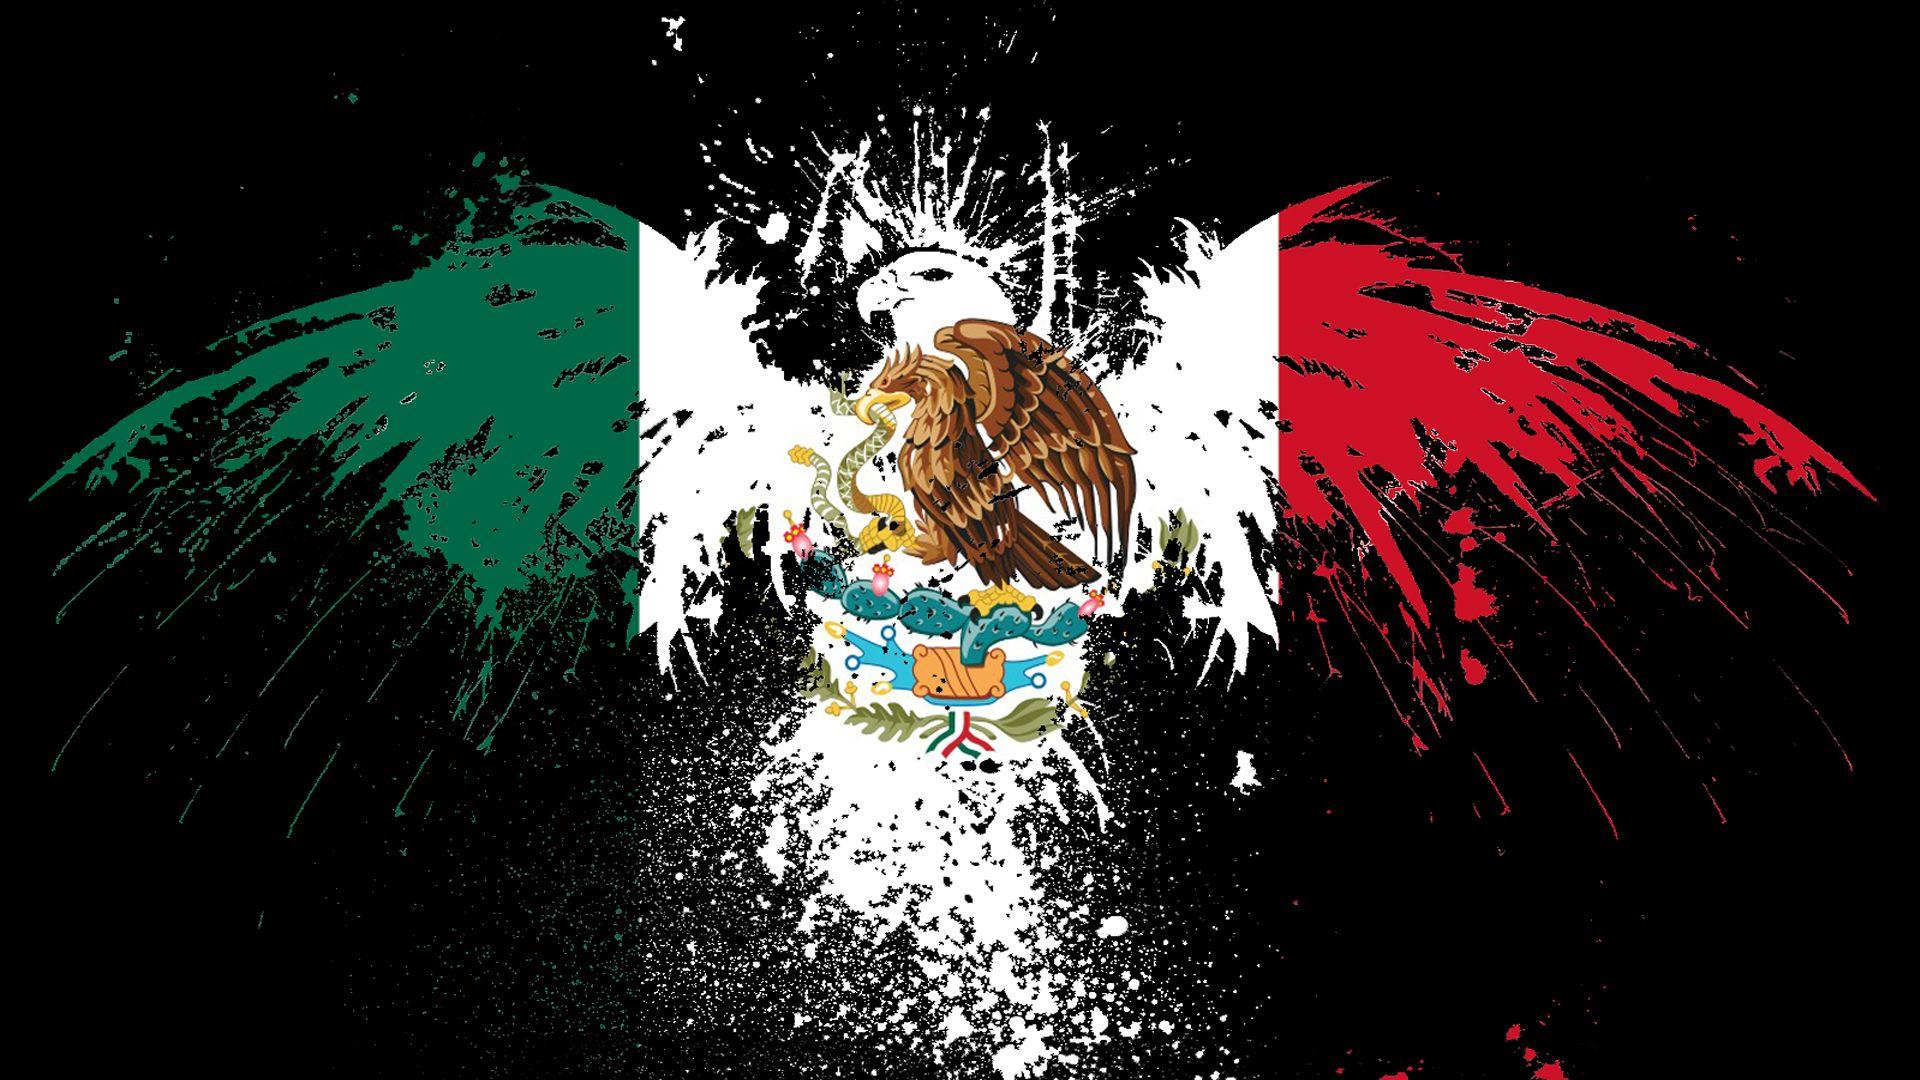 Descargarfondosdepantalla On Twitter Mexico Flag Pictures Of Flags Mexico